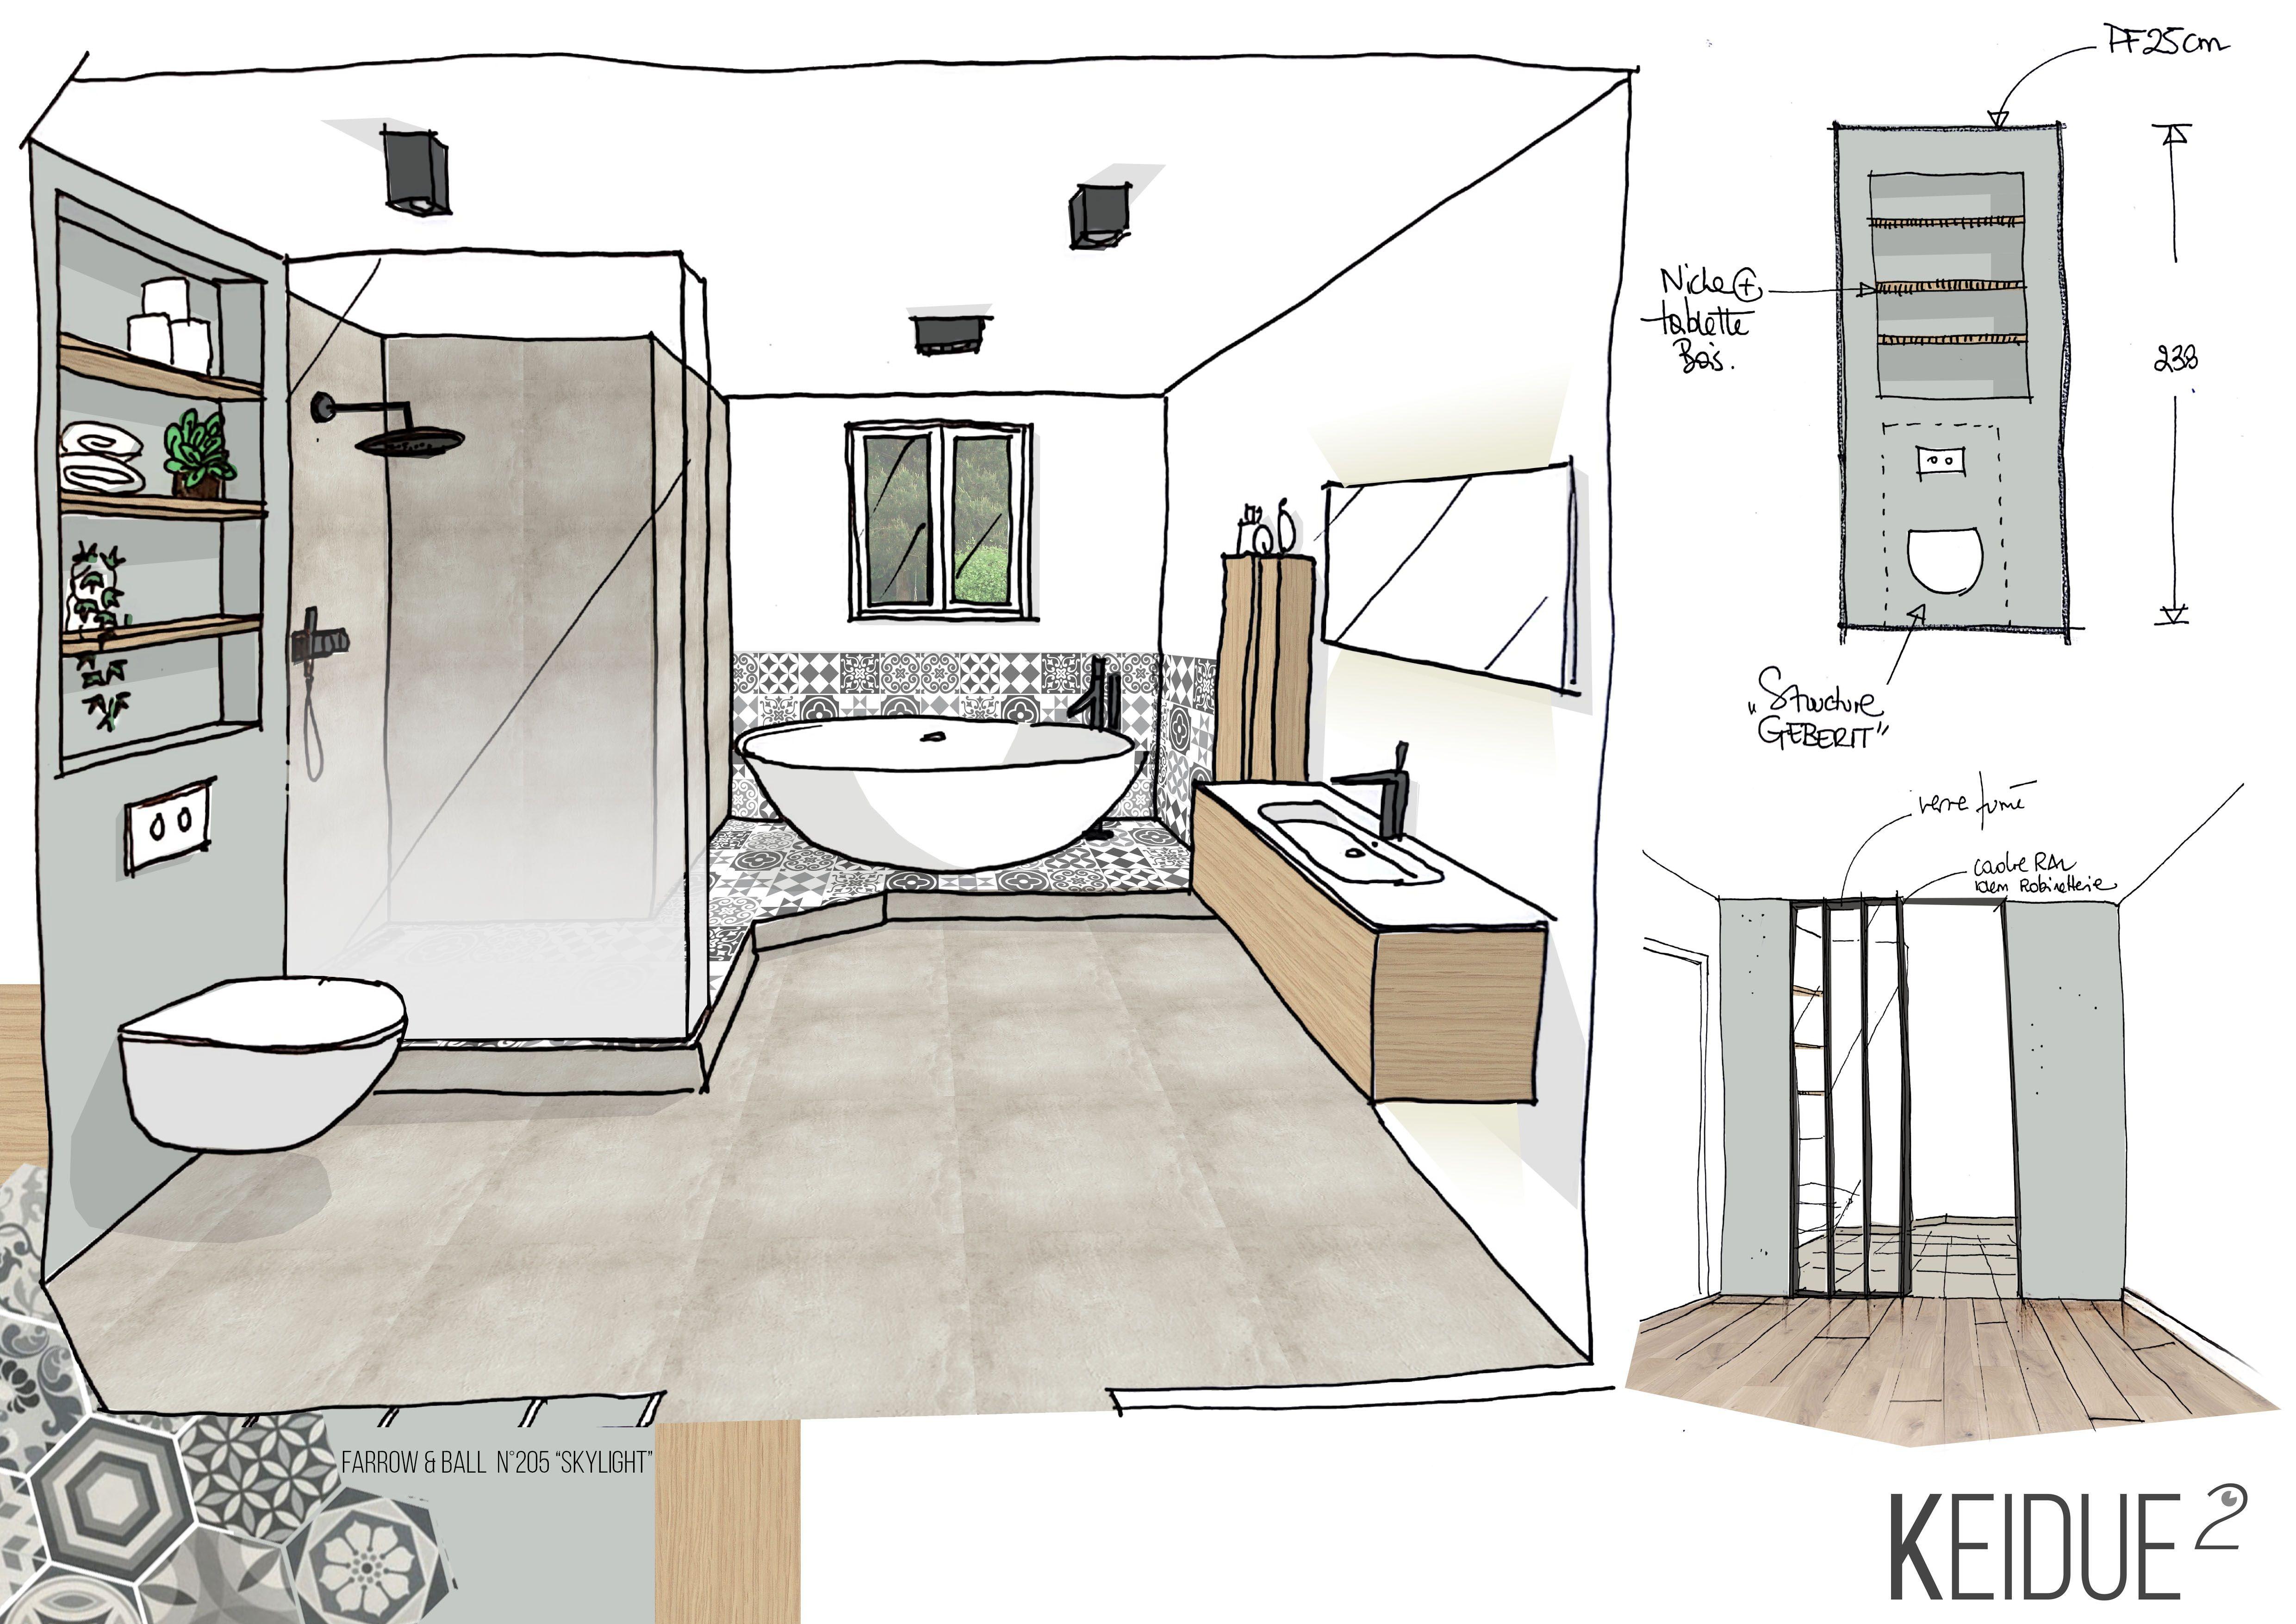 Dessin Salle De Bain croquis salle de bains agence keidue² www.keidueagence